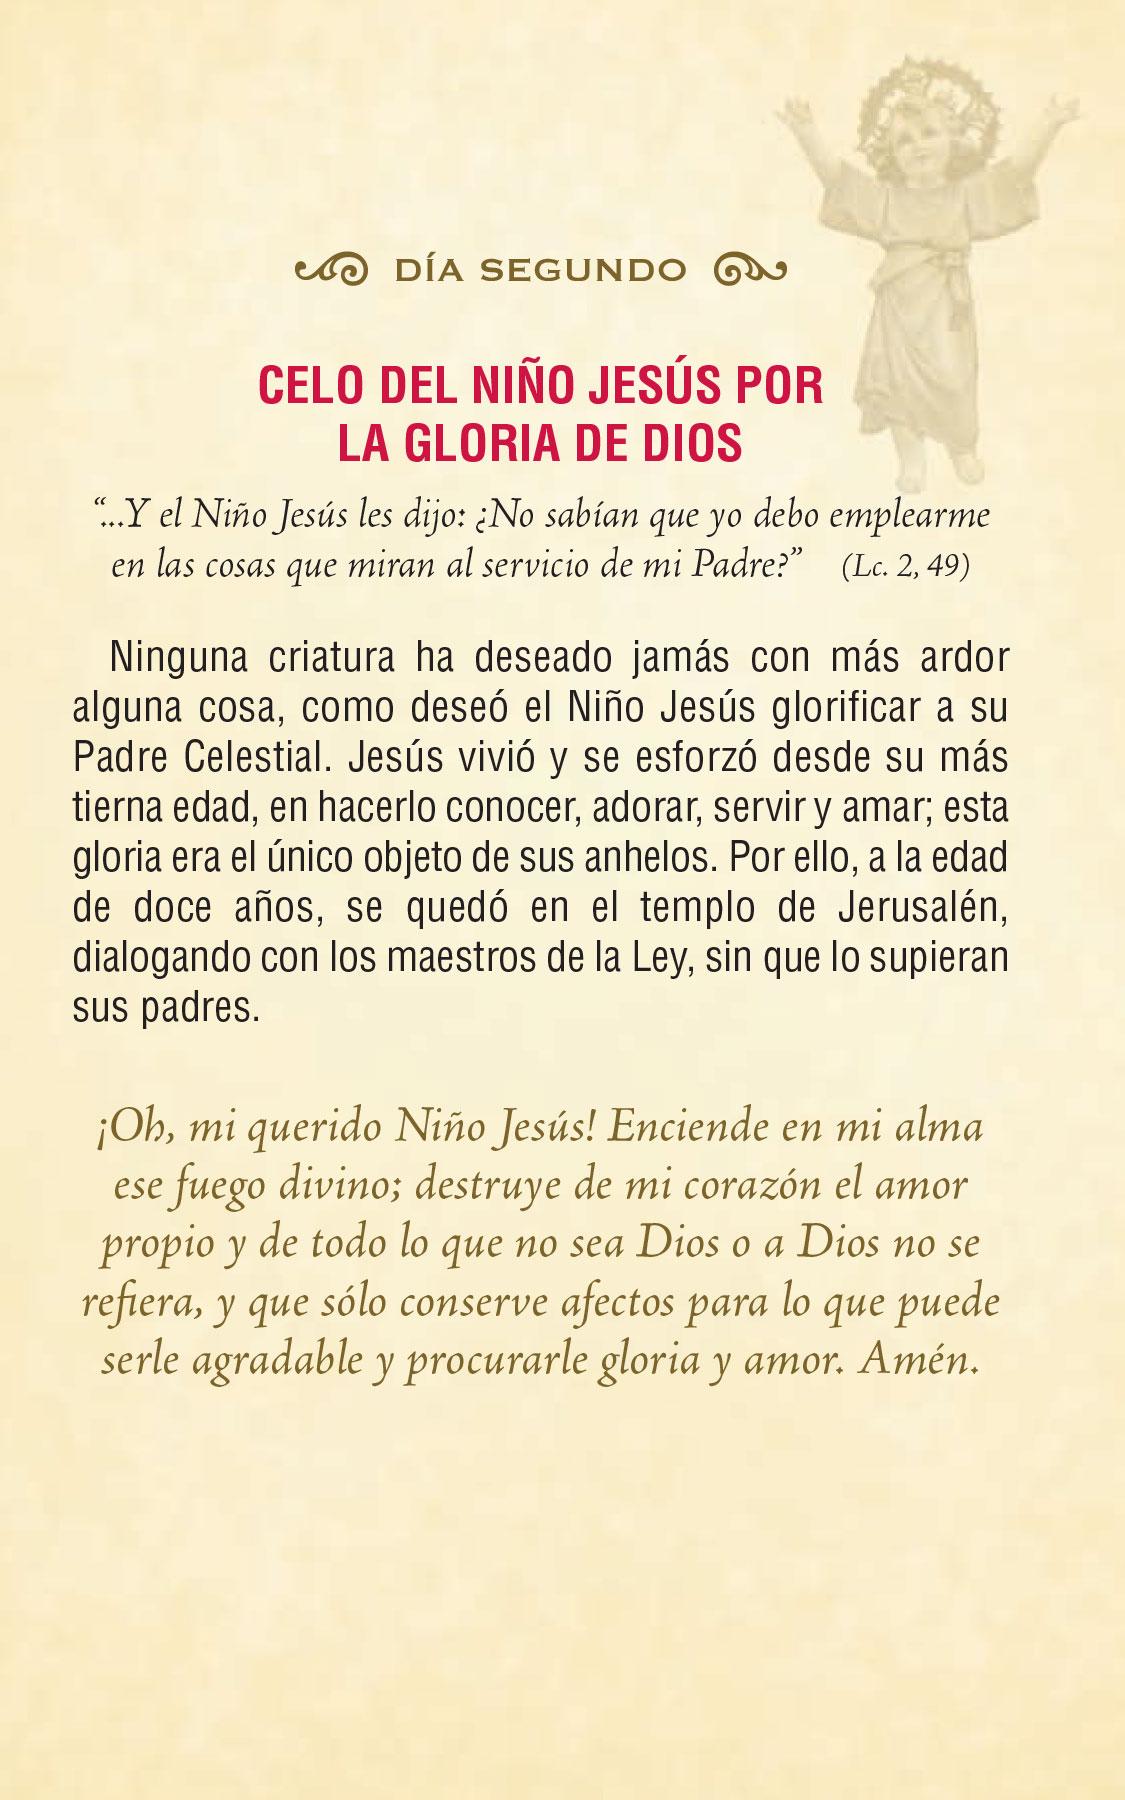 Divino Niño Jesús - día segundo